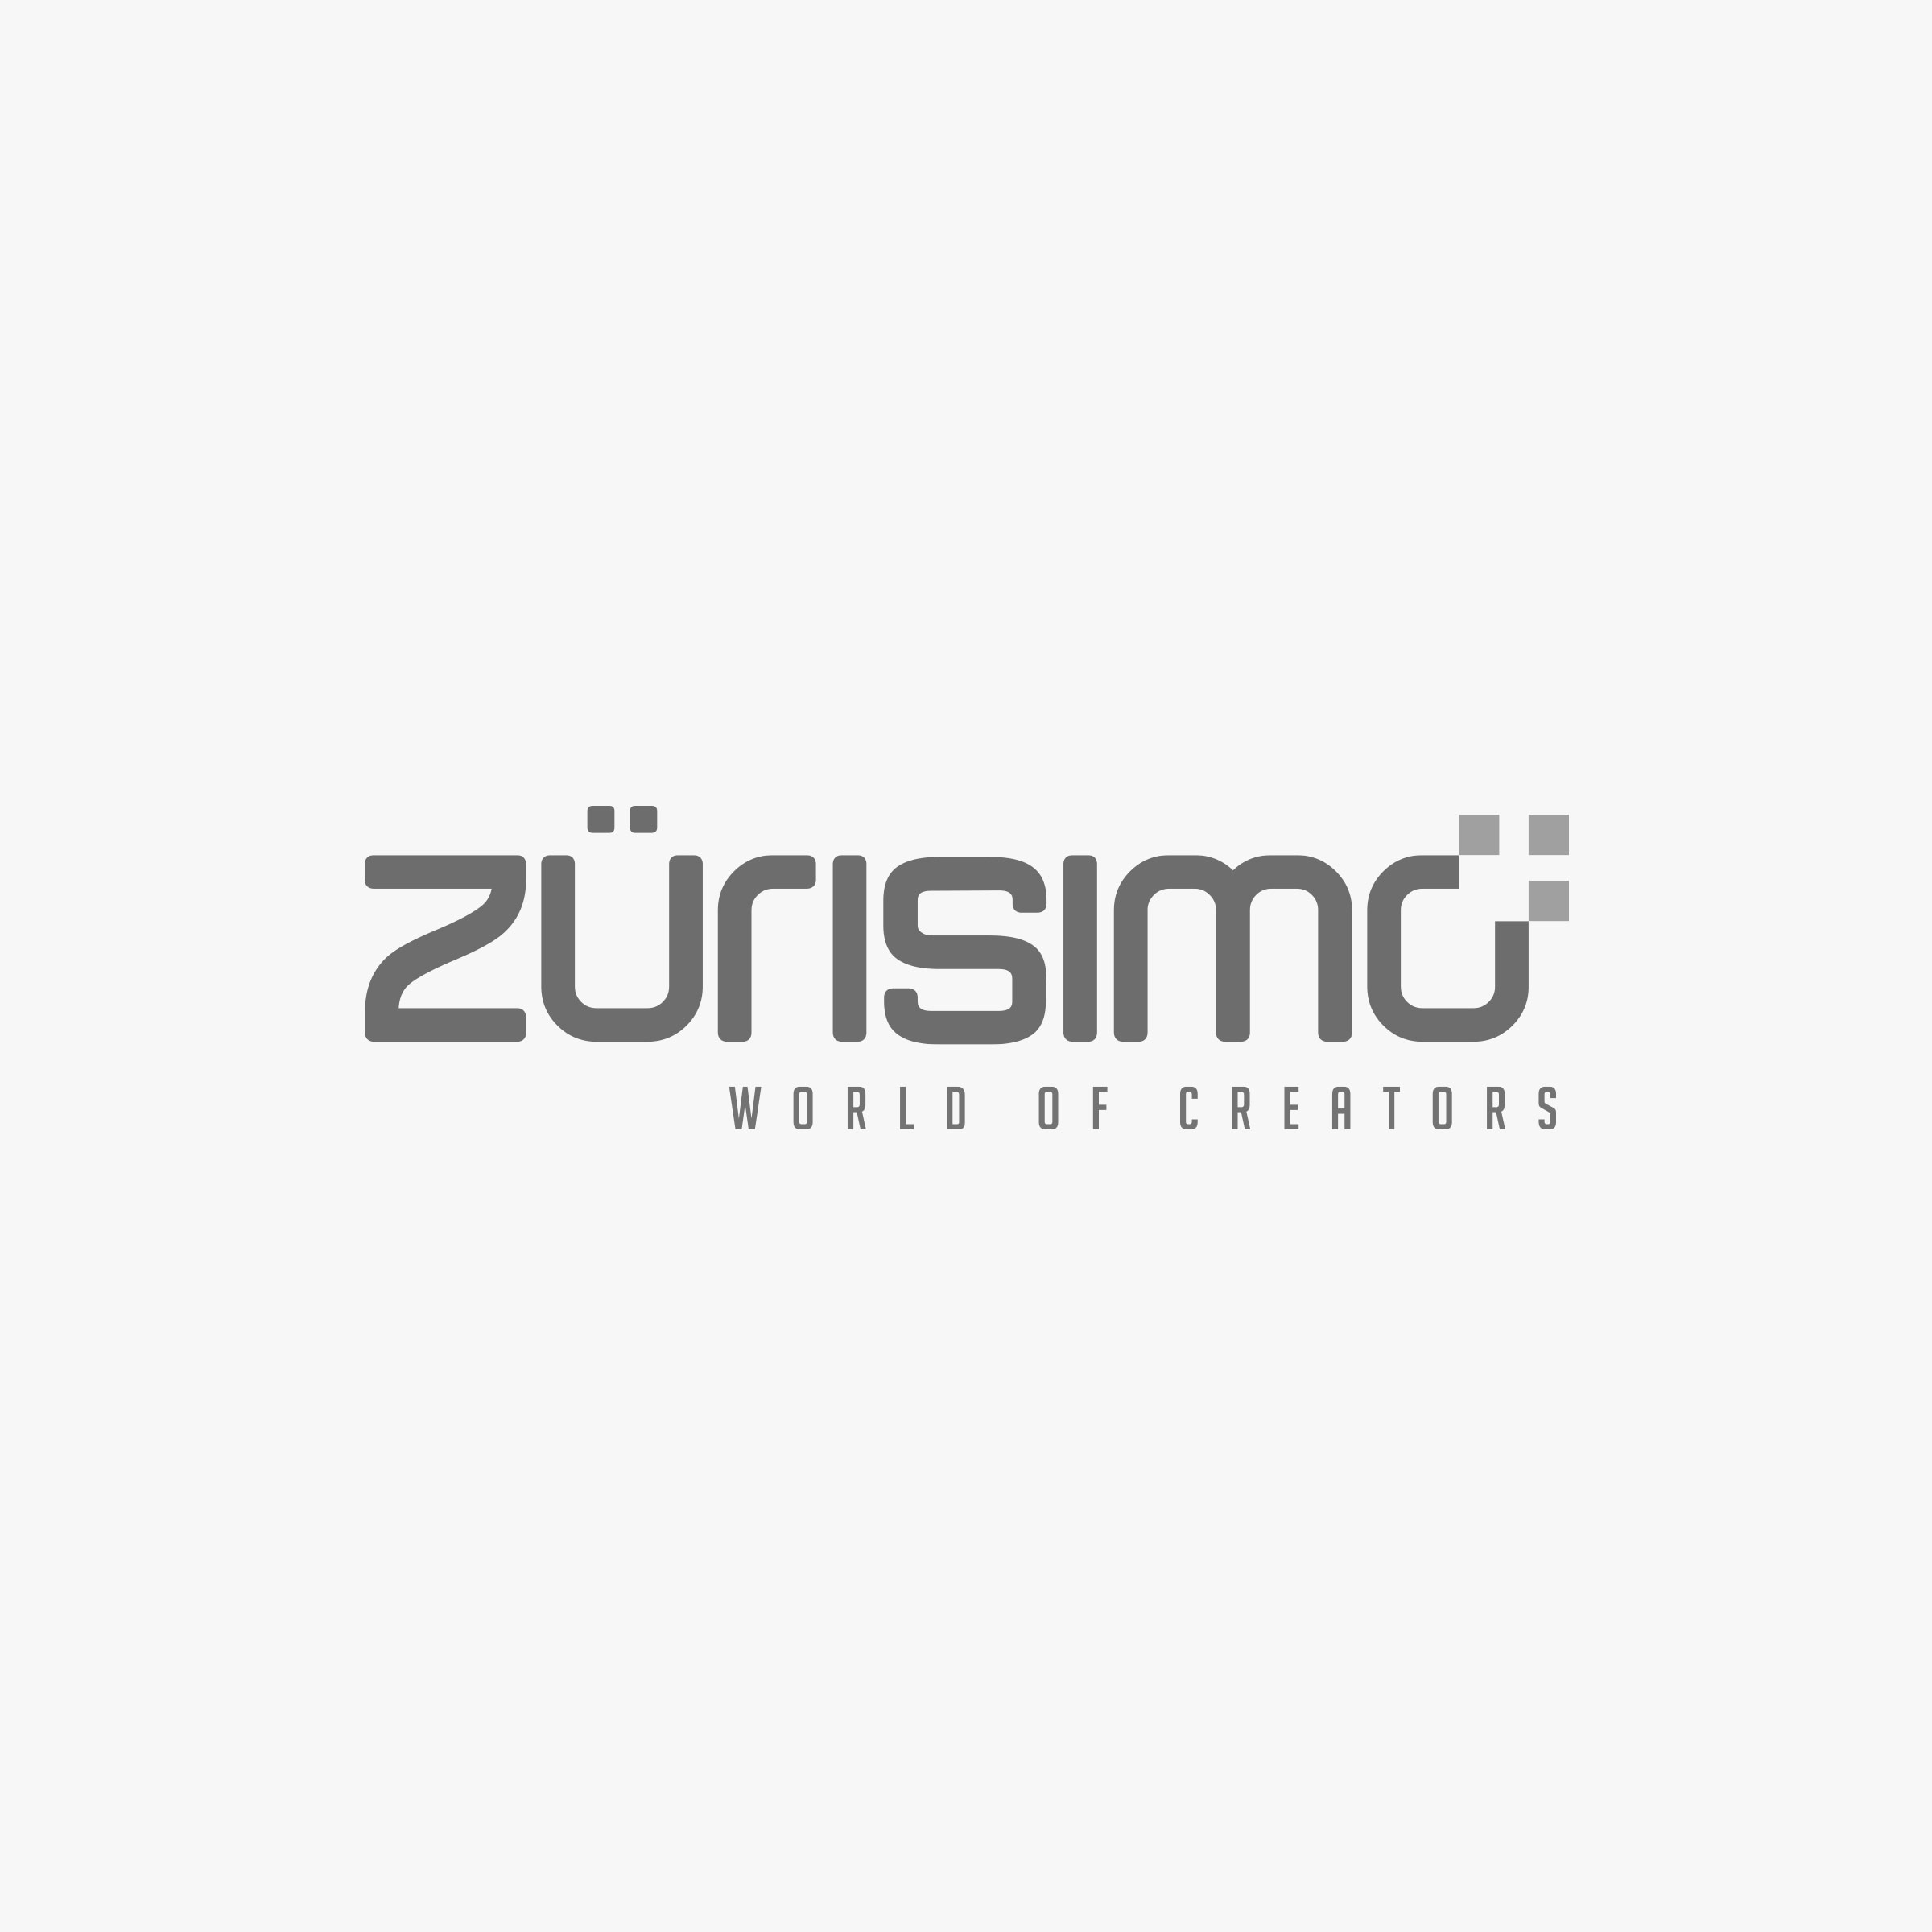 zurisimo-logo-design-by-create.jpg